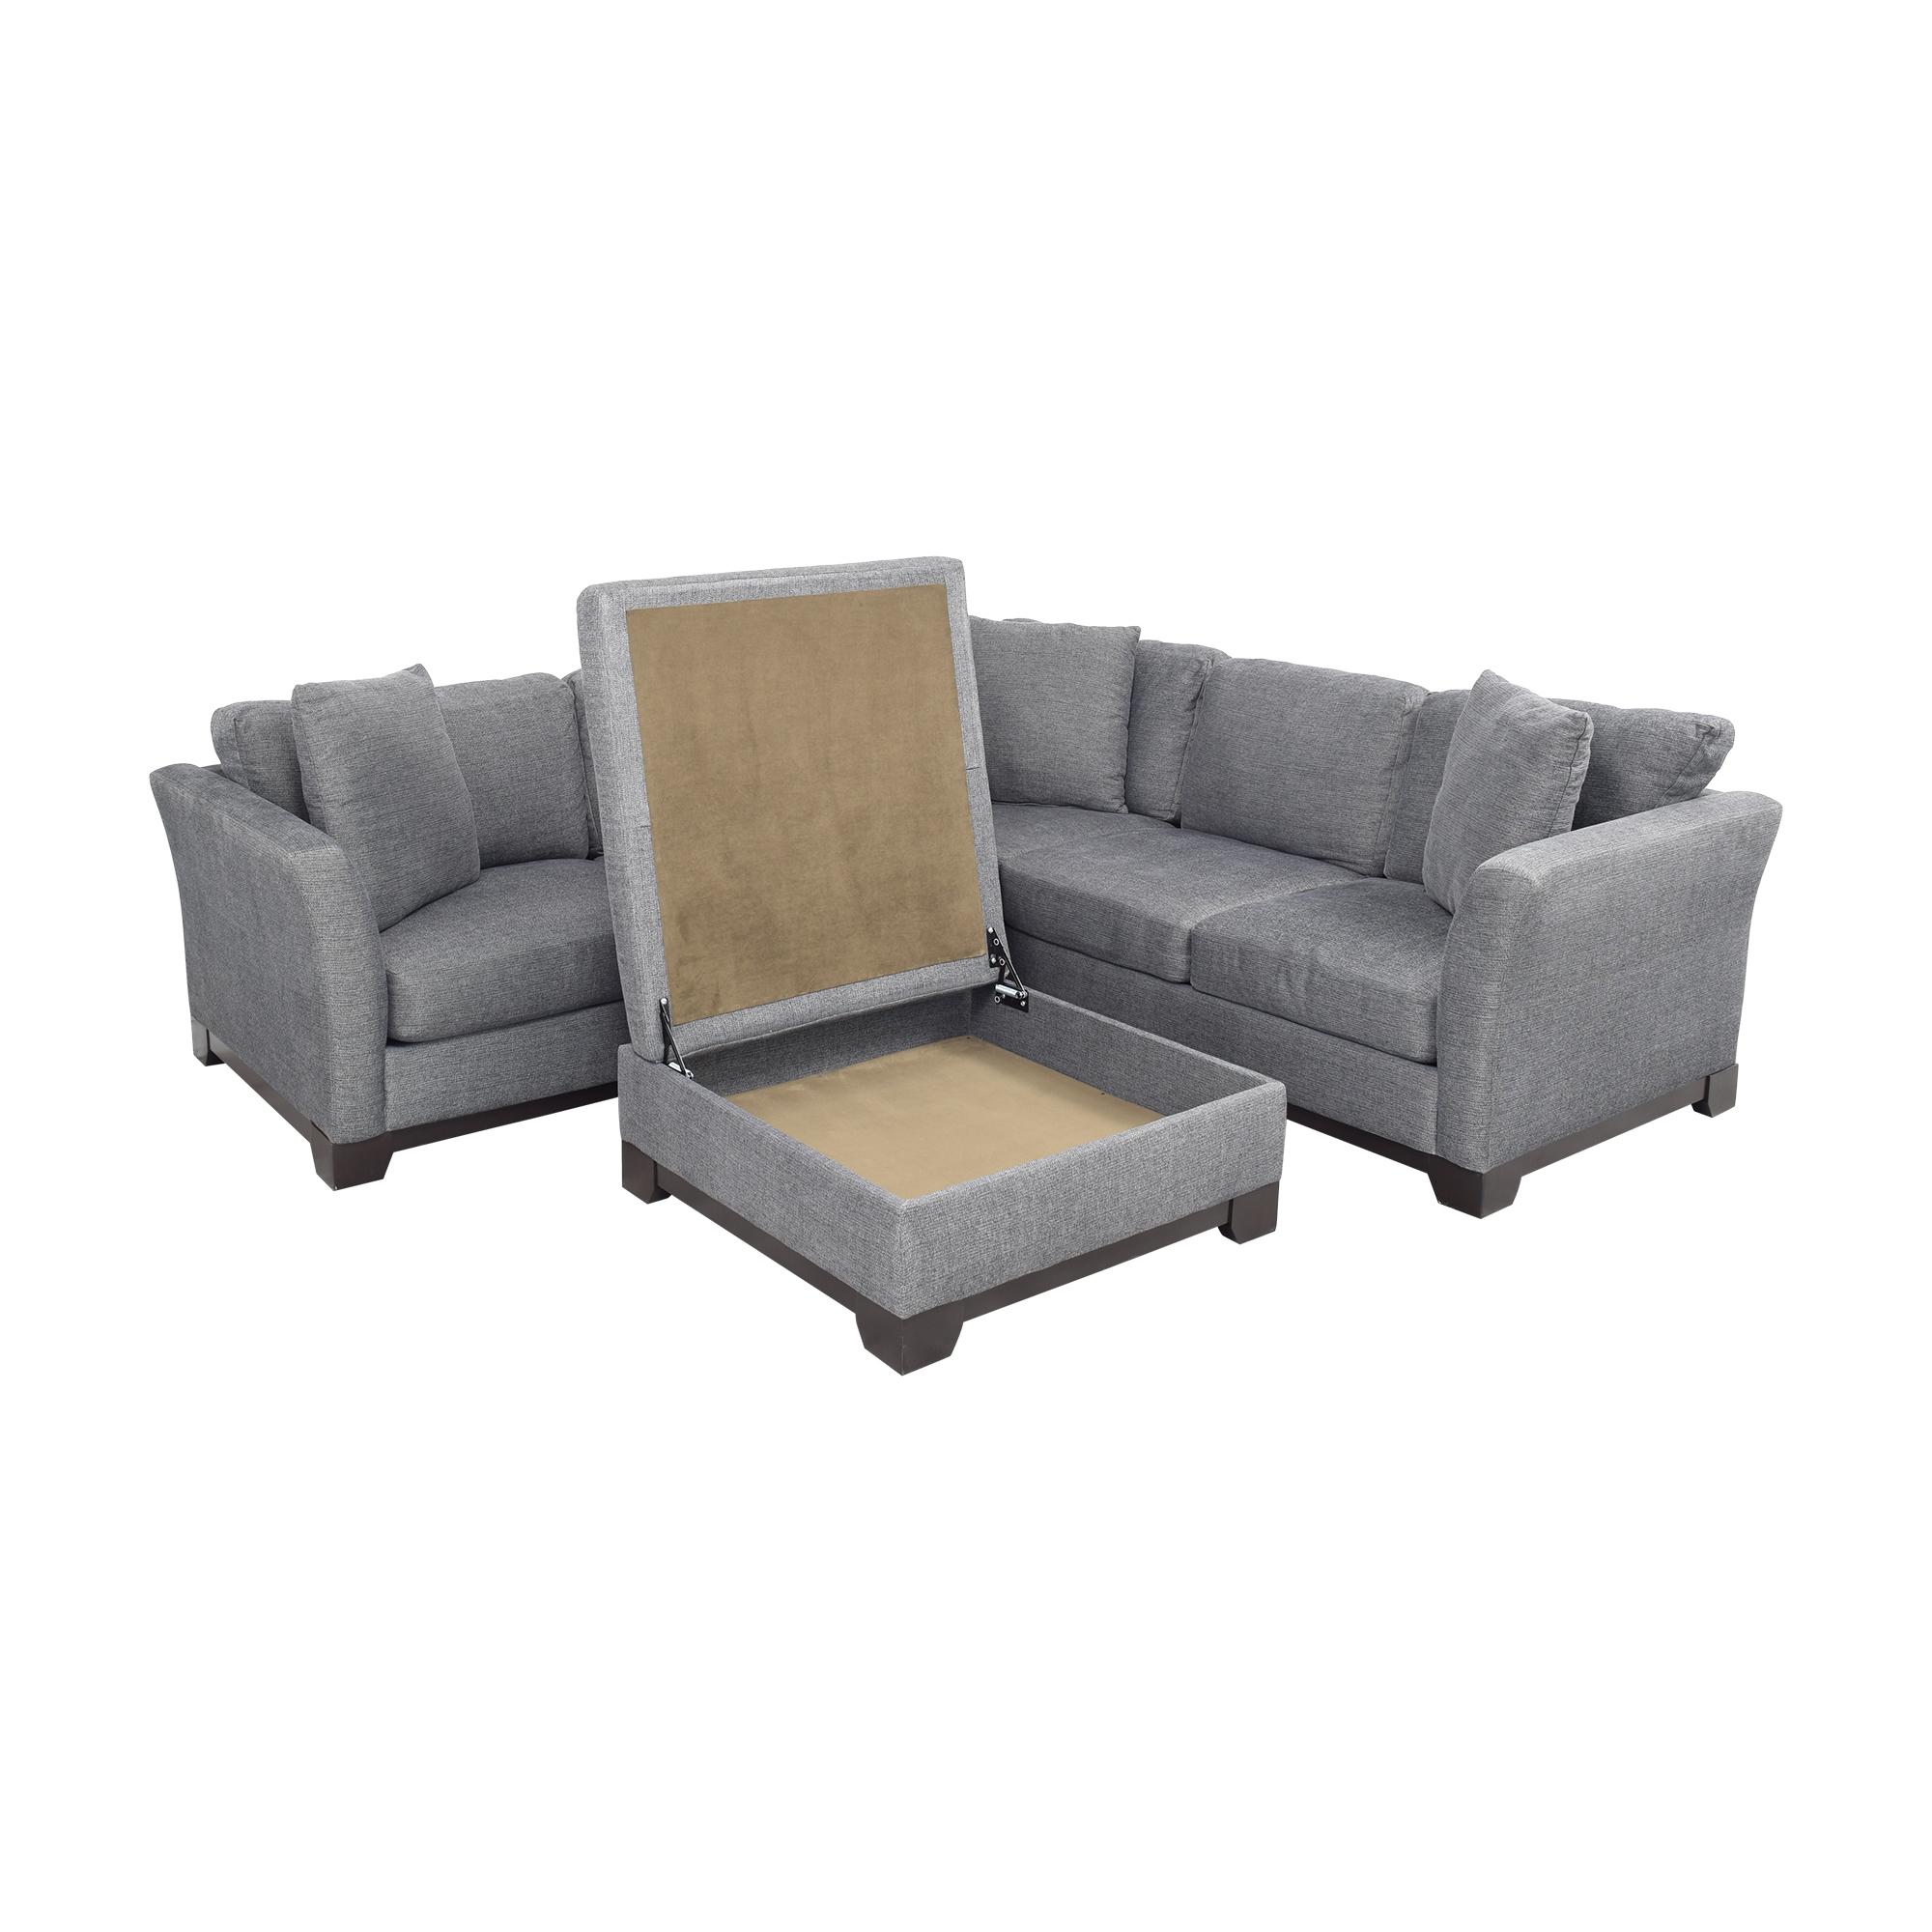 Jonathan Louis Jonathan Louis Elliot II Apartment Sectional Sofa with Storage Ottoman second hand